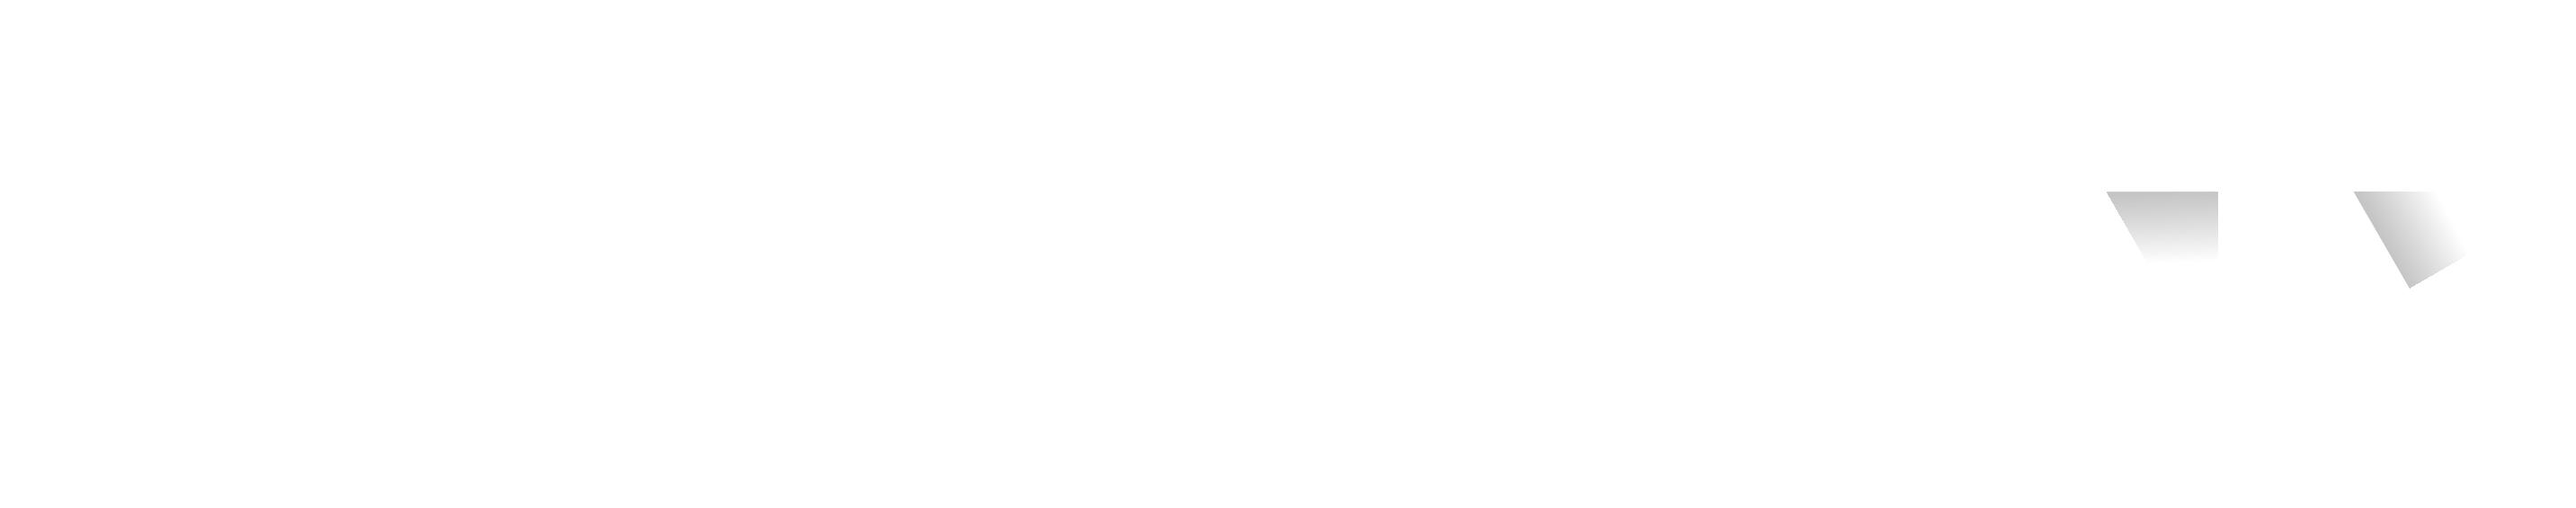 Teamleader_logo_cmyk_white.png